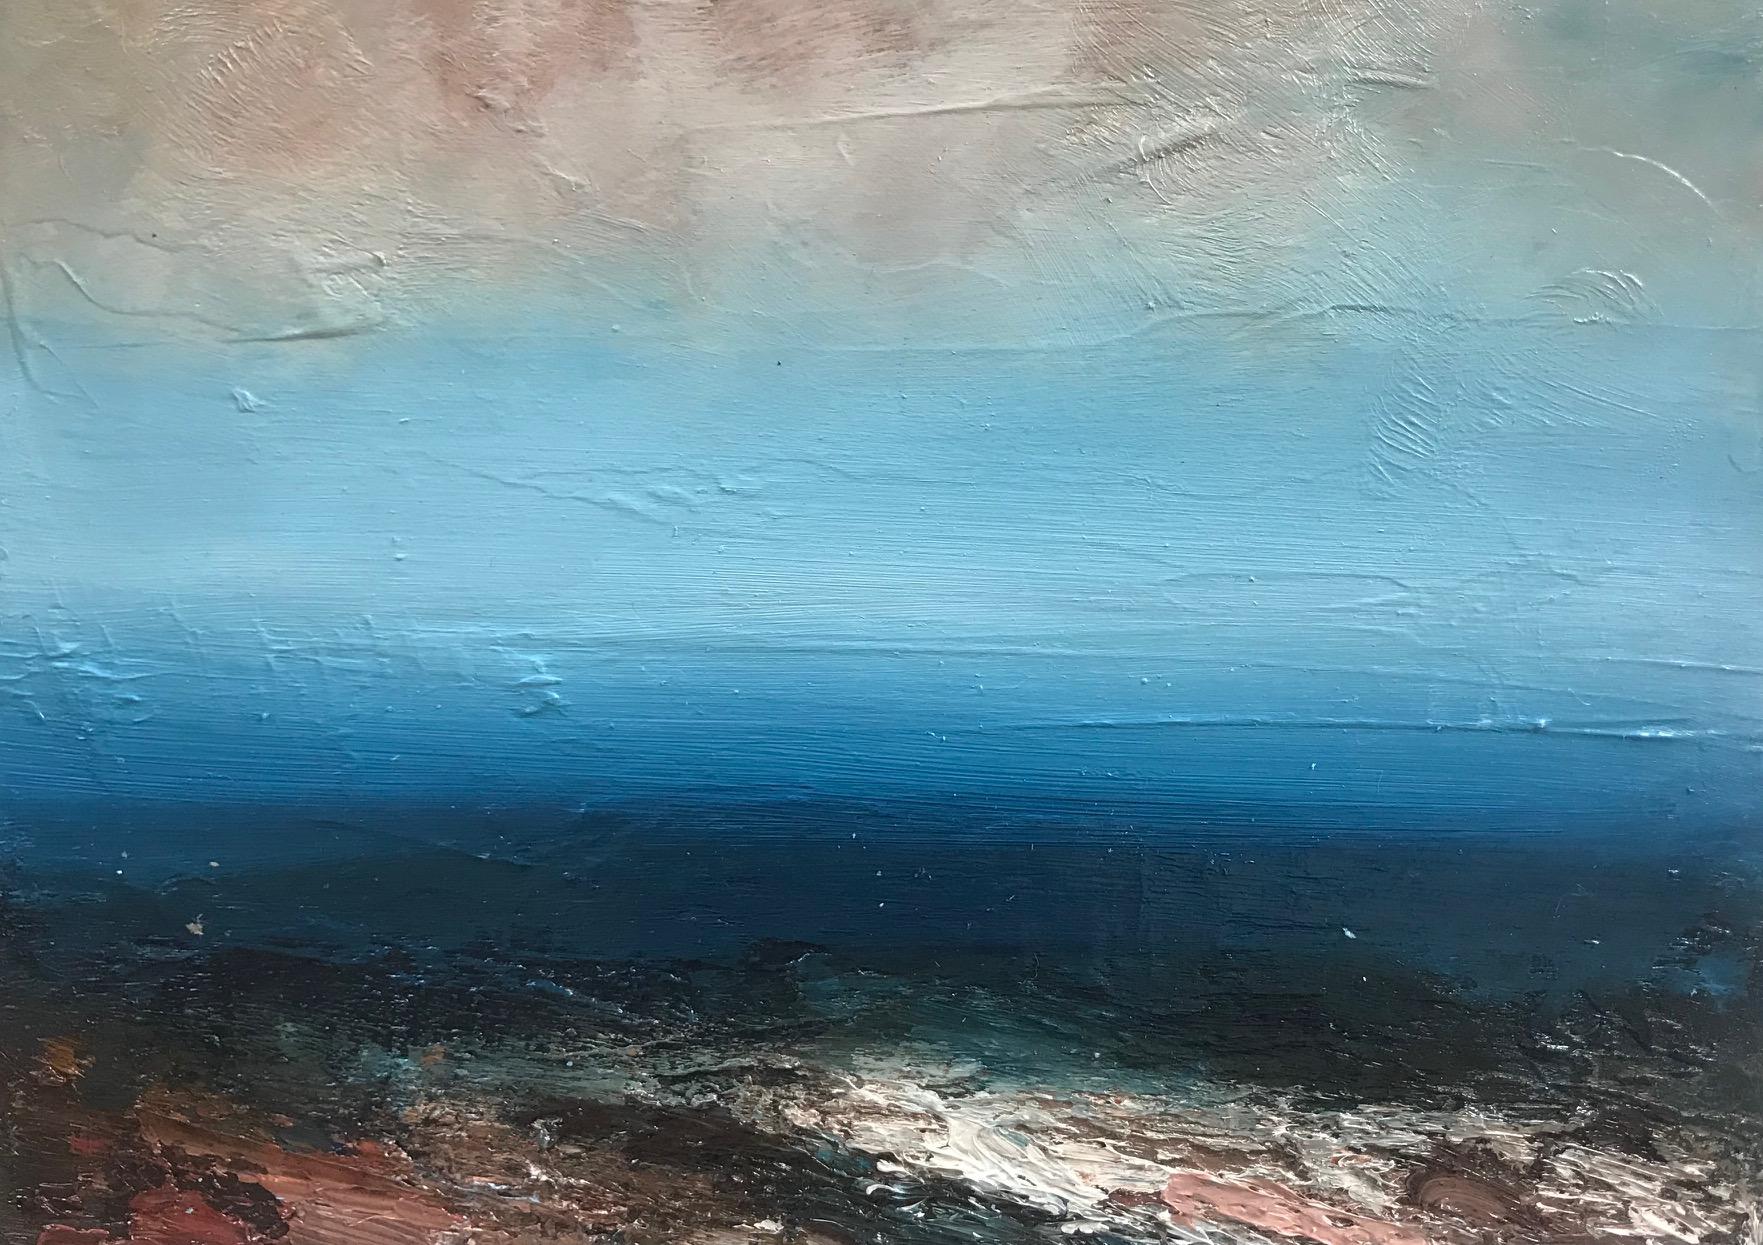 Artist: Hannah Ludnow  Title: Seascape I  Size: 20 x 48cm  Medium: oil on canvas  Price: £360